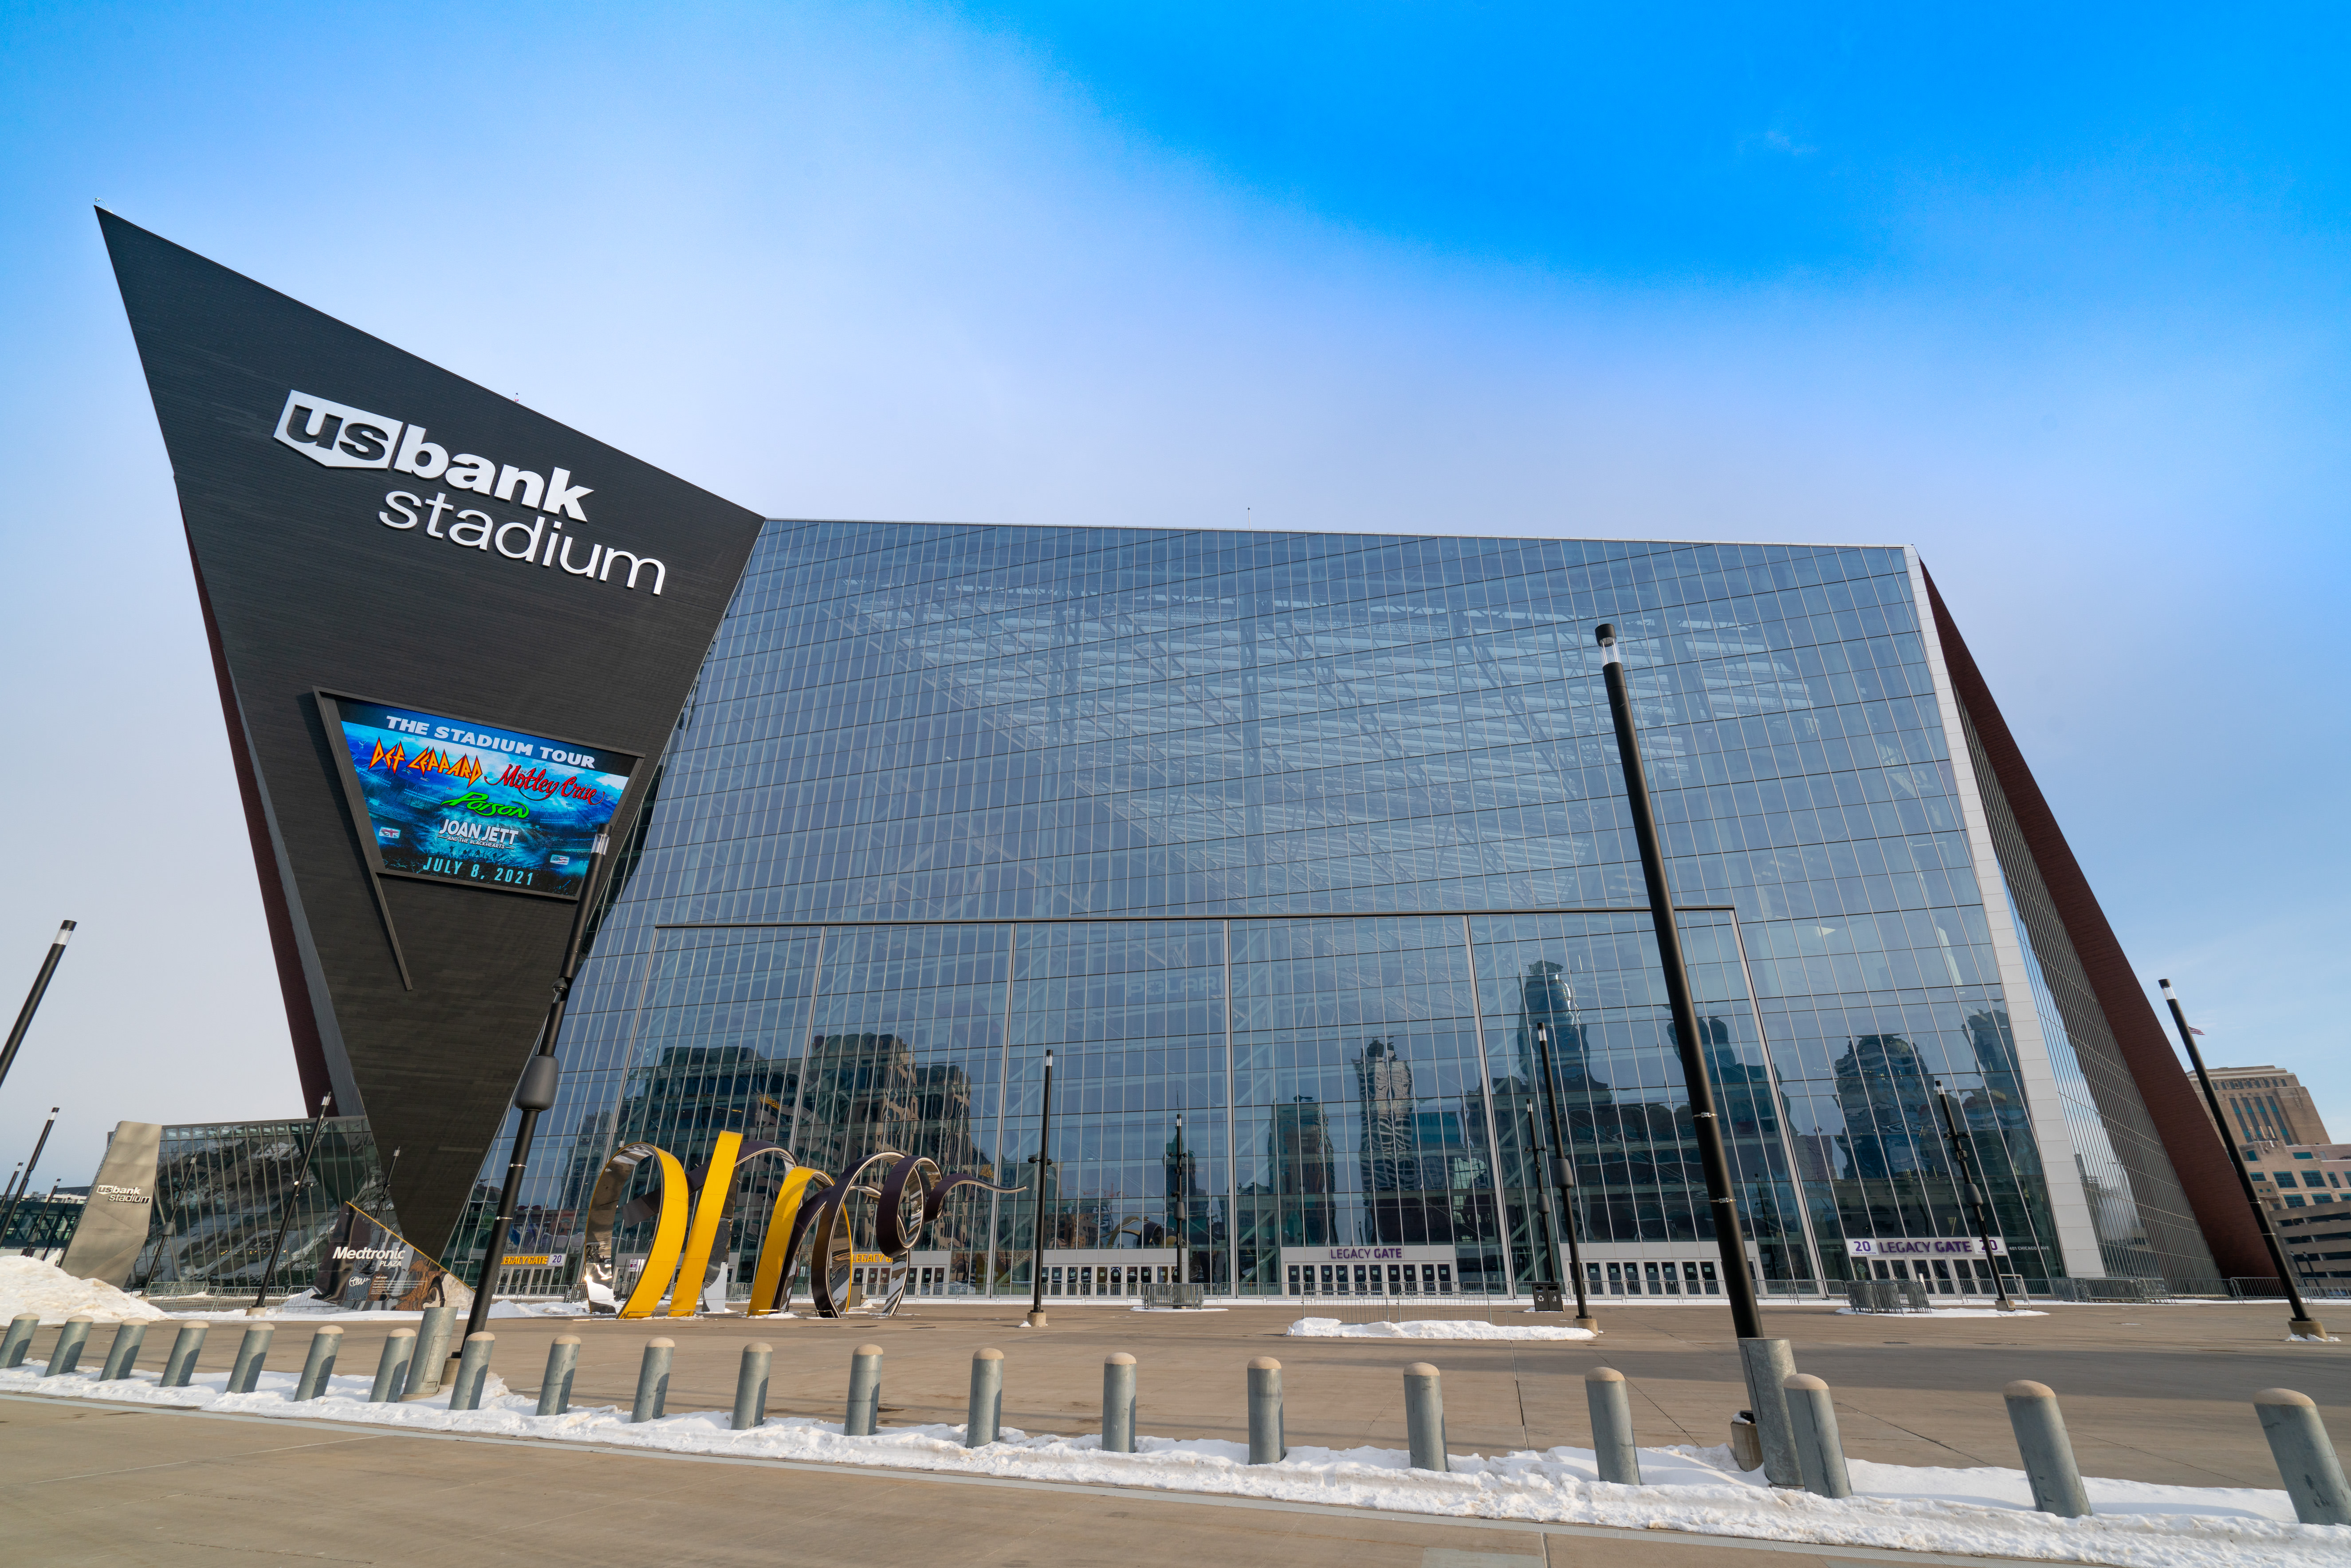 Minneapolis Exteriors And Landmarks - 2021